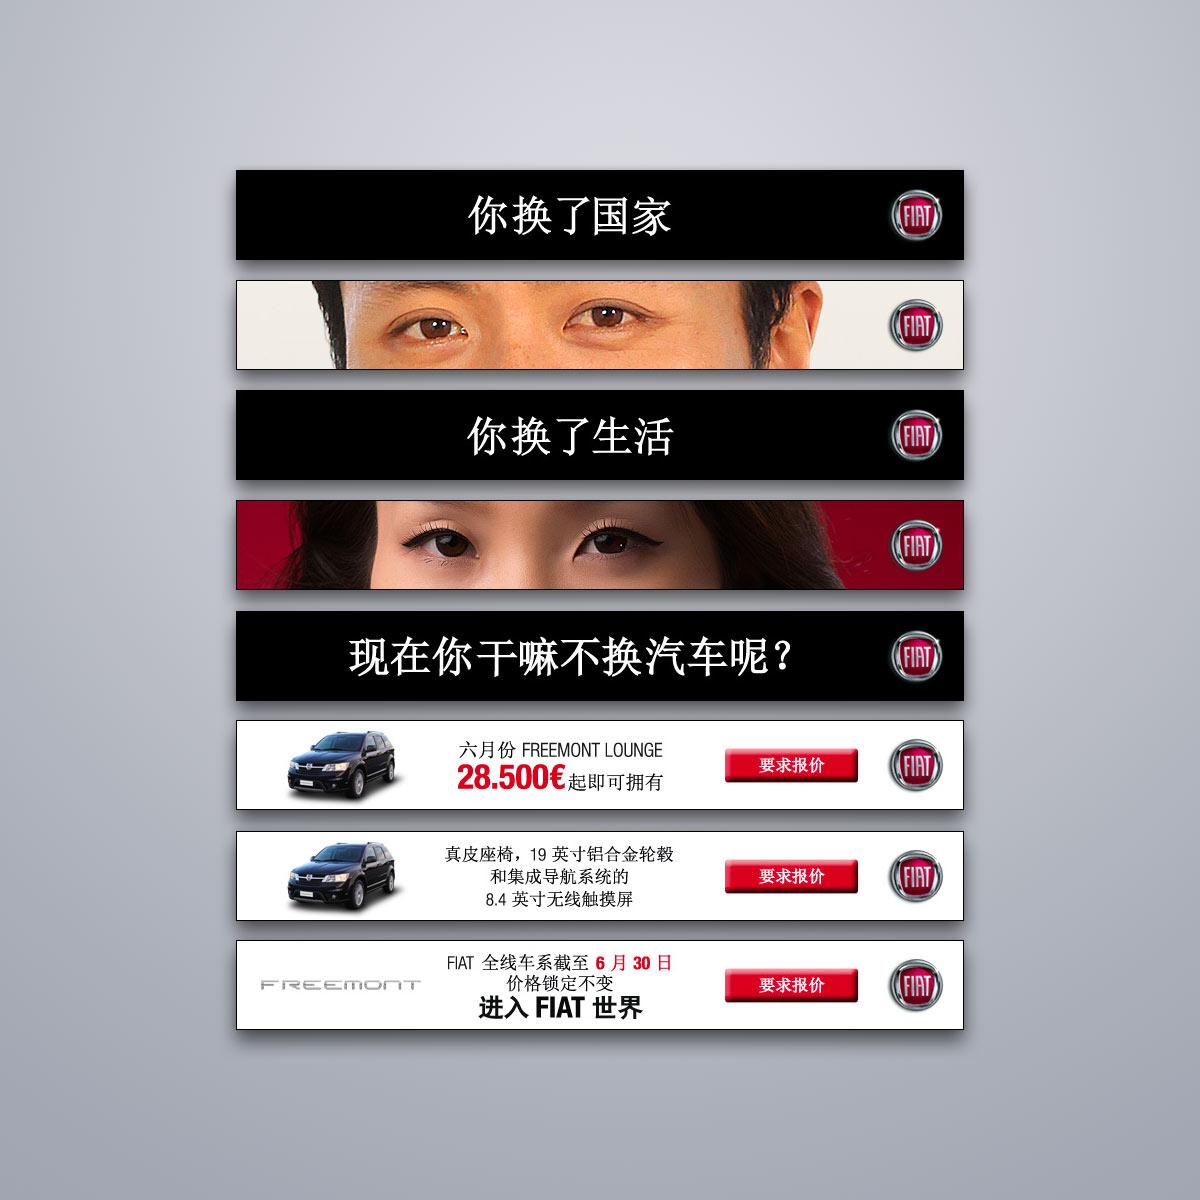 Banner leaderboard in cinese - Campagna Display Advertising Online per FIAT